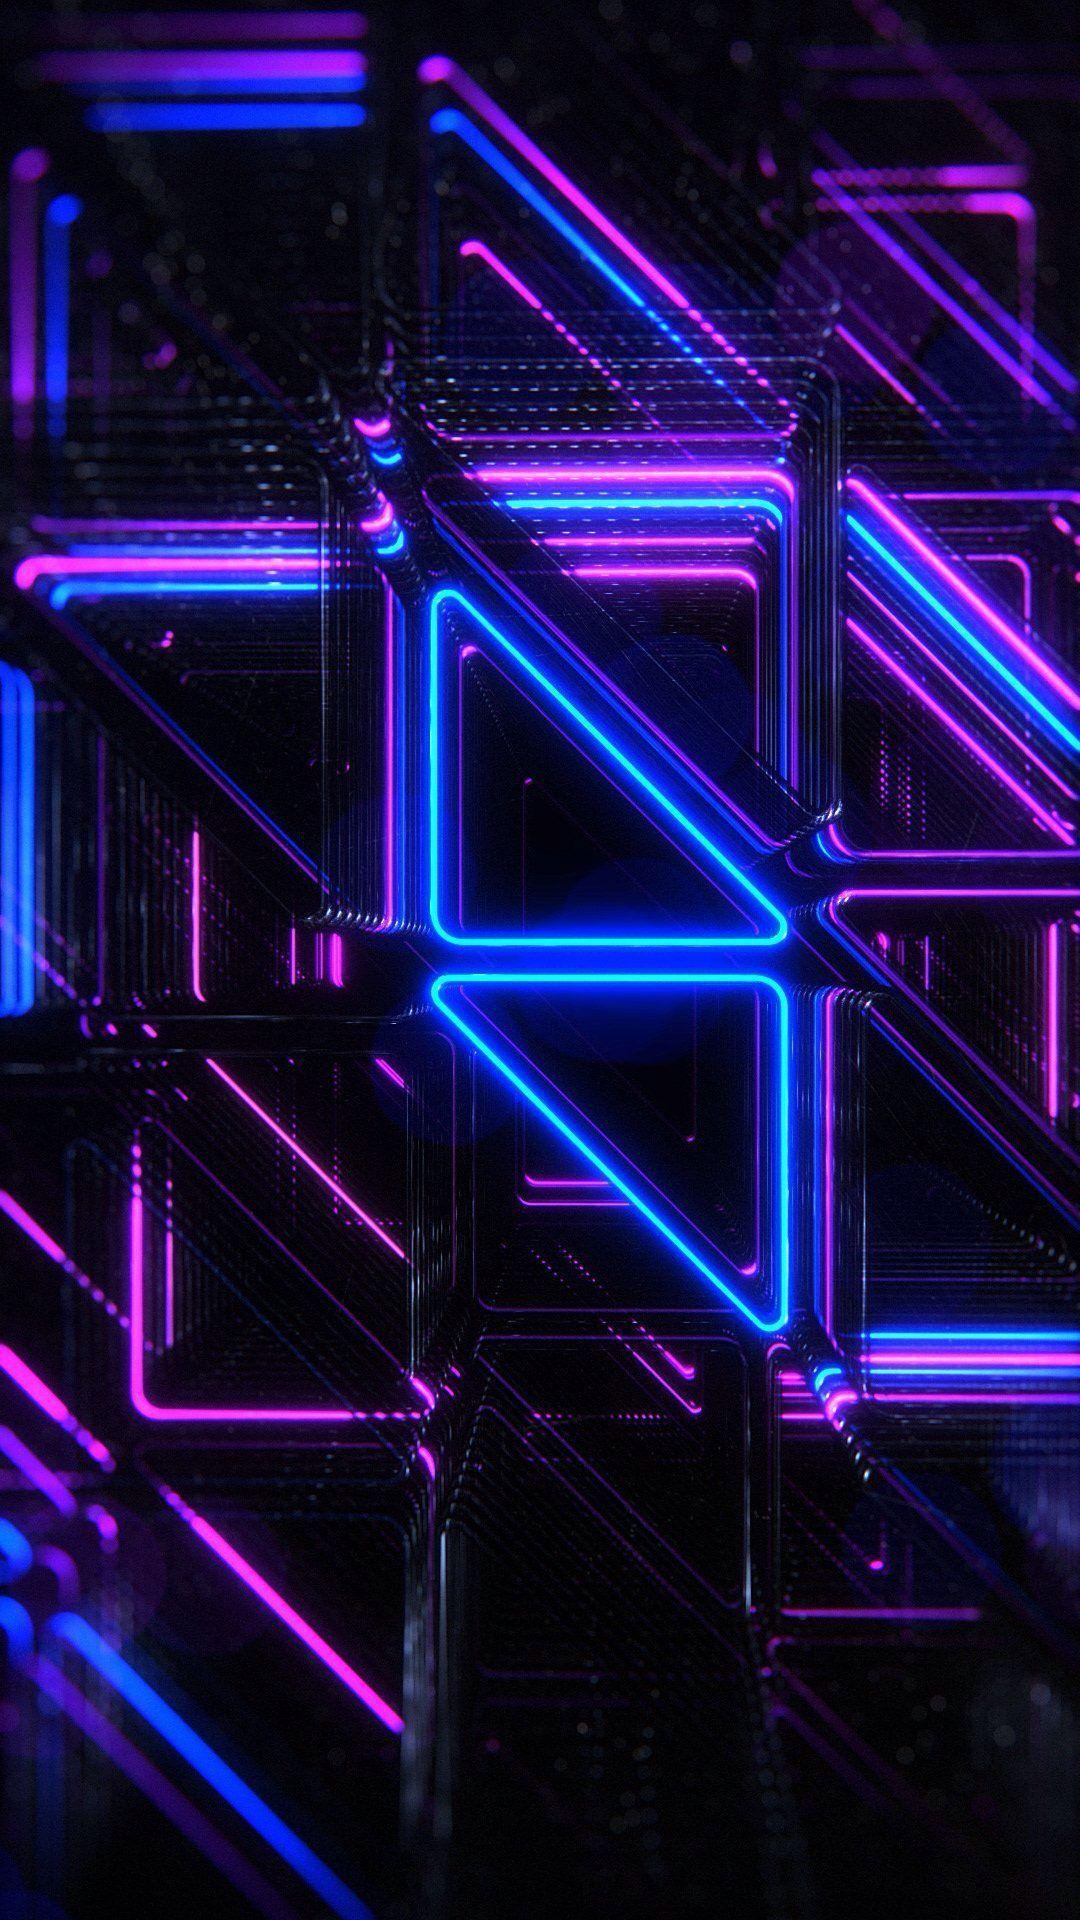 Visual Light Effect Wallpapee Neon Wallpaper Black And Purple Wallpaper Iphone Background Art